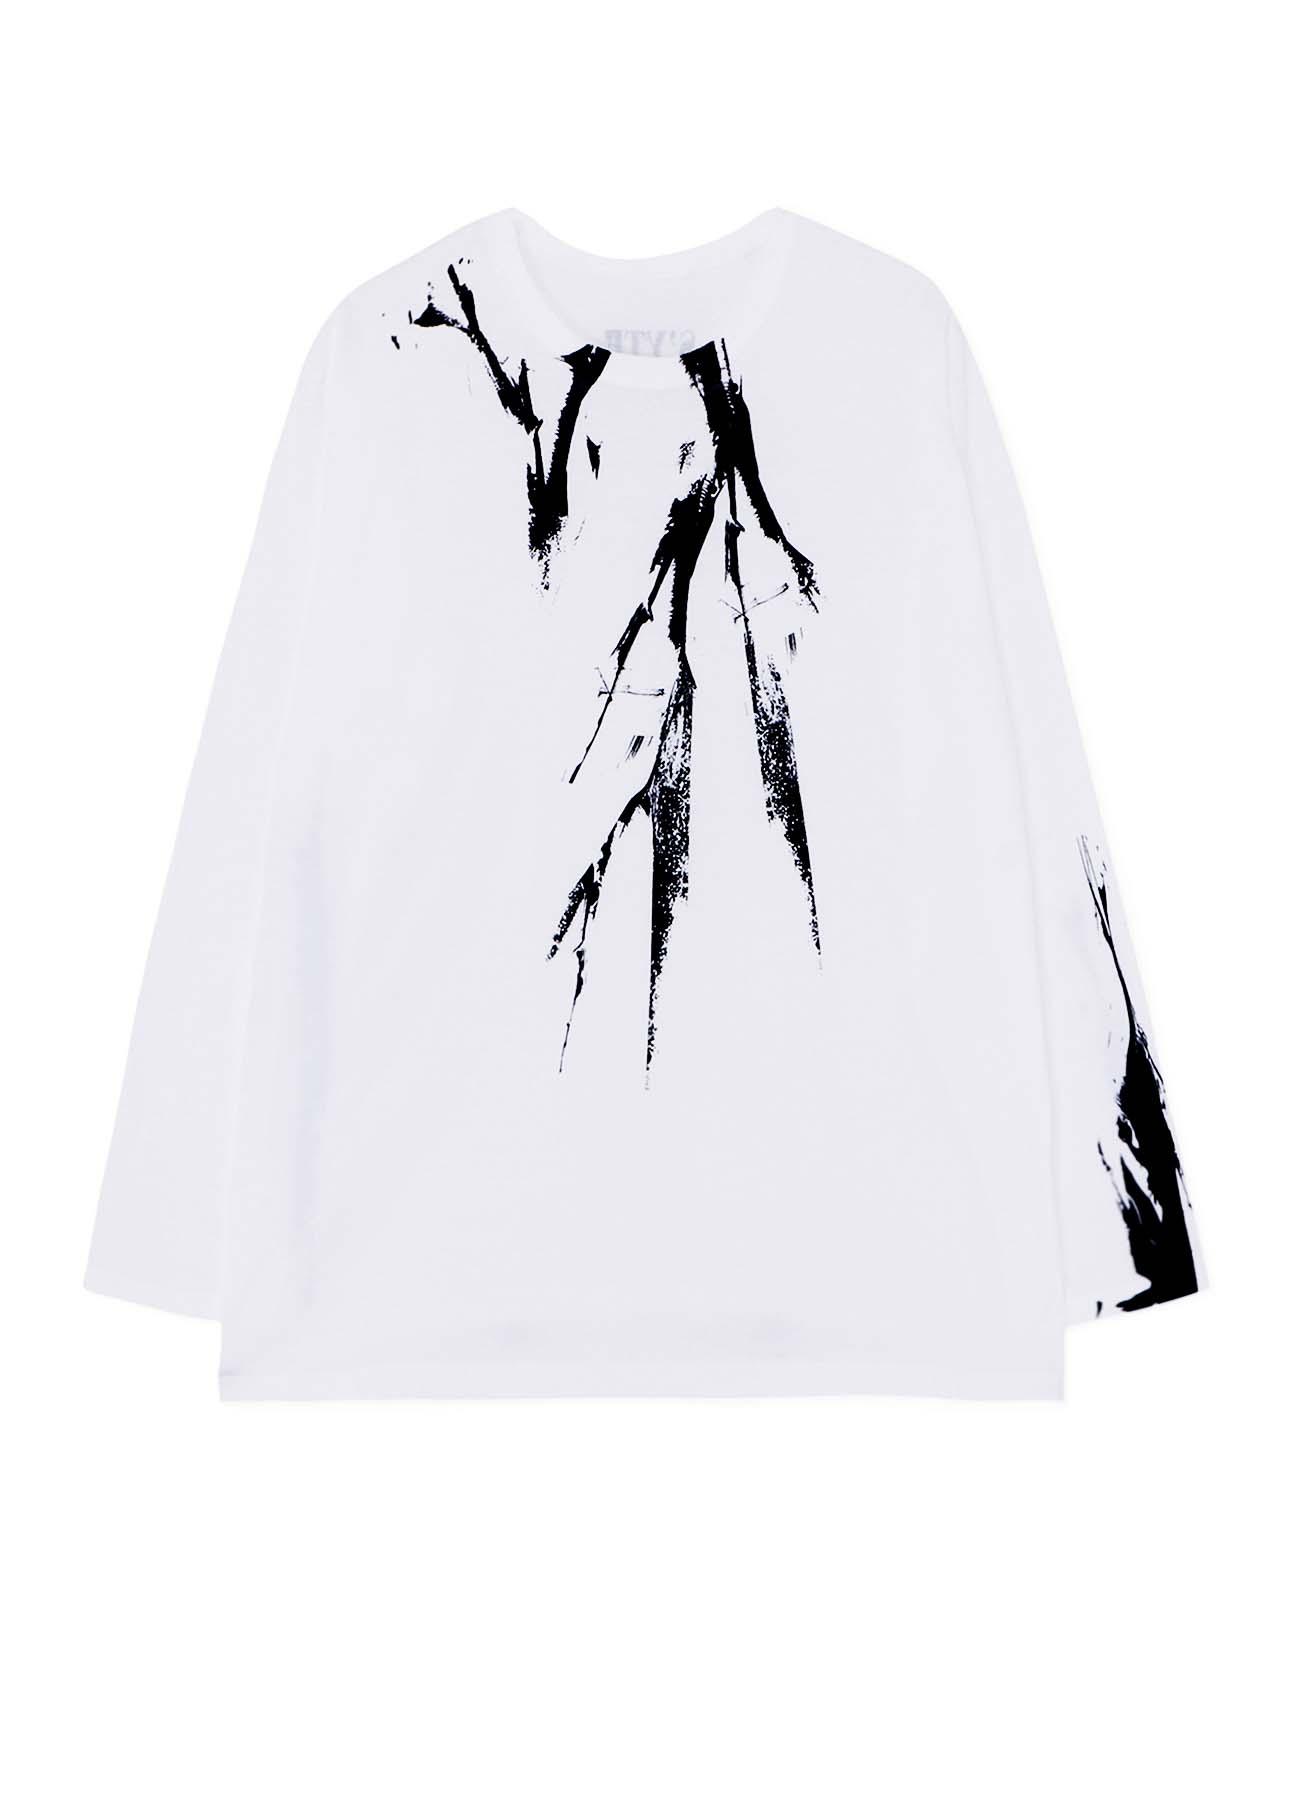 20/CottonJersey 22nd Century Sweetheart Mermaid T-shirt